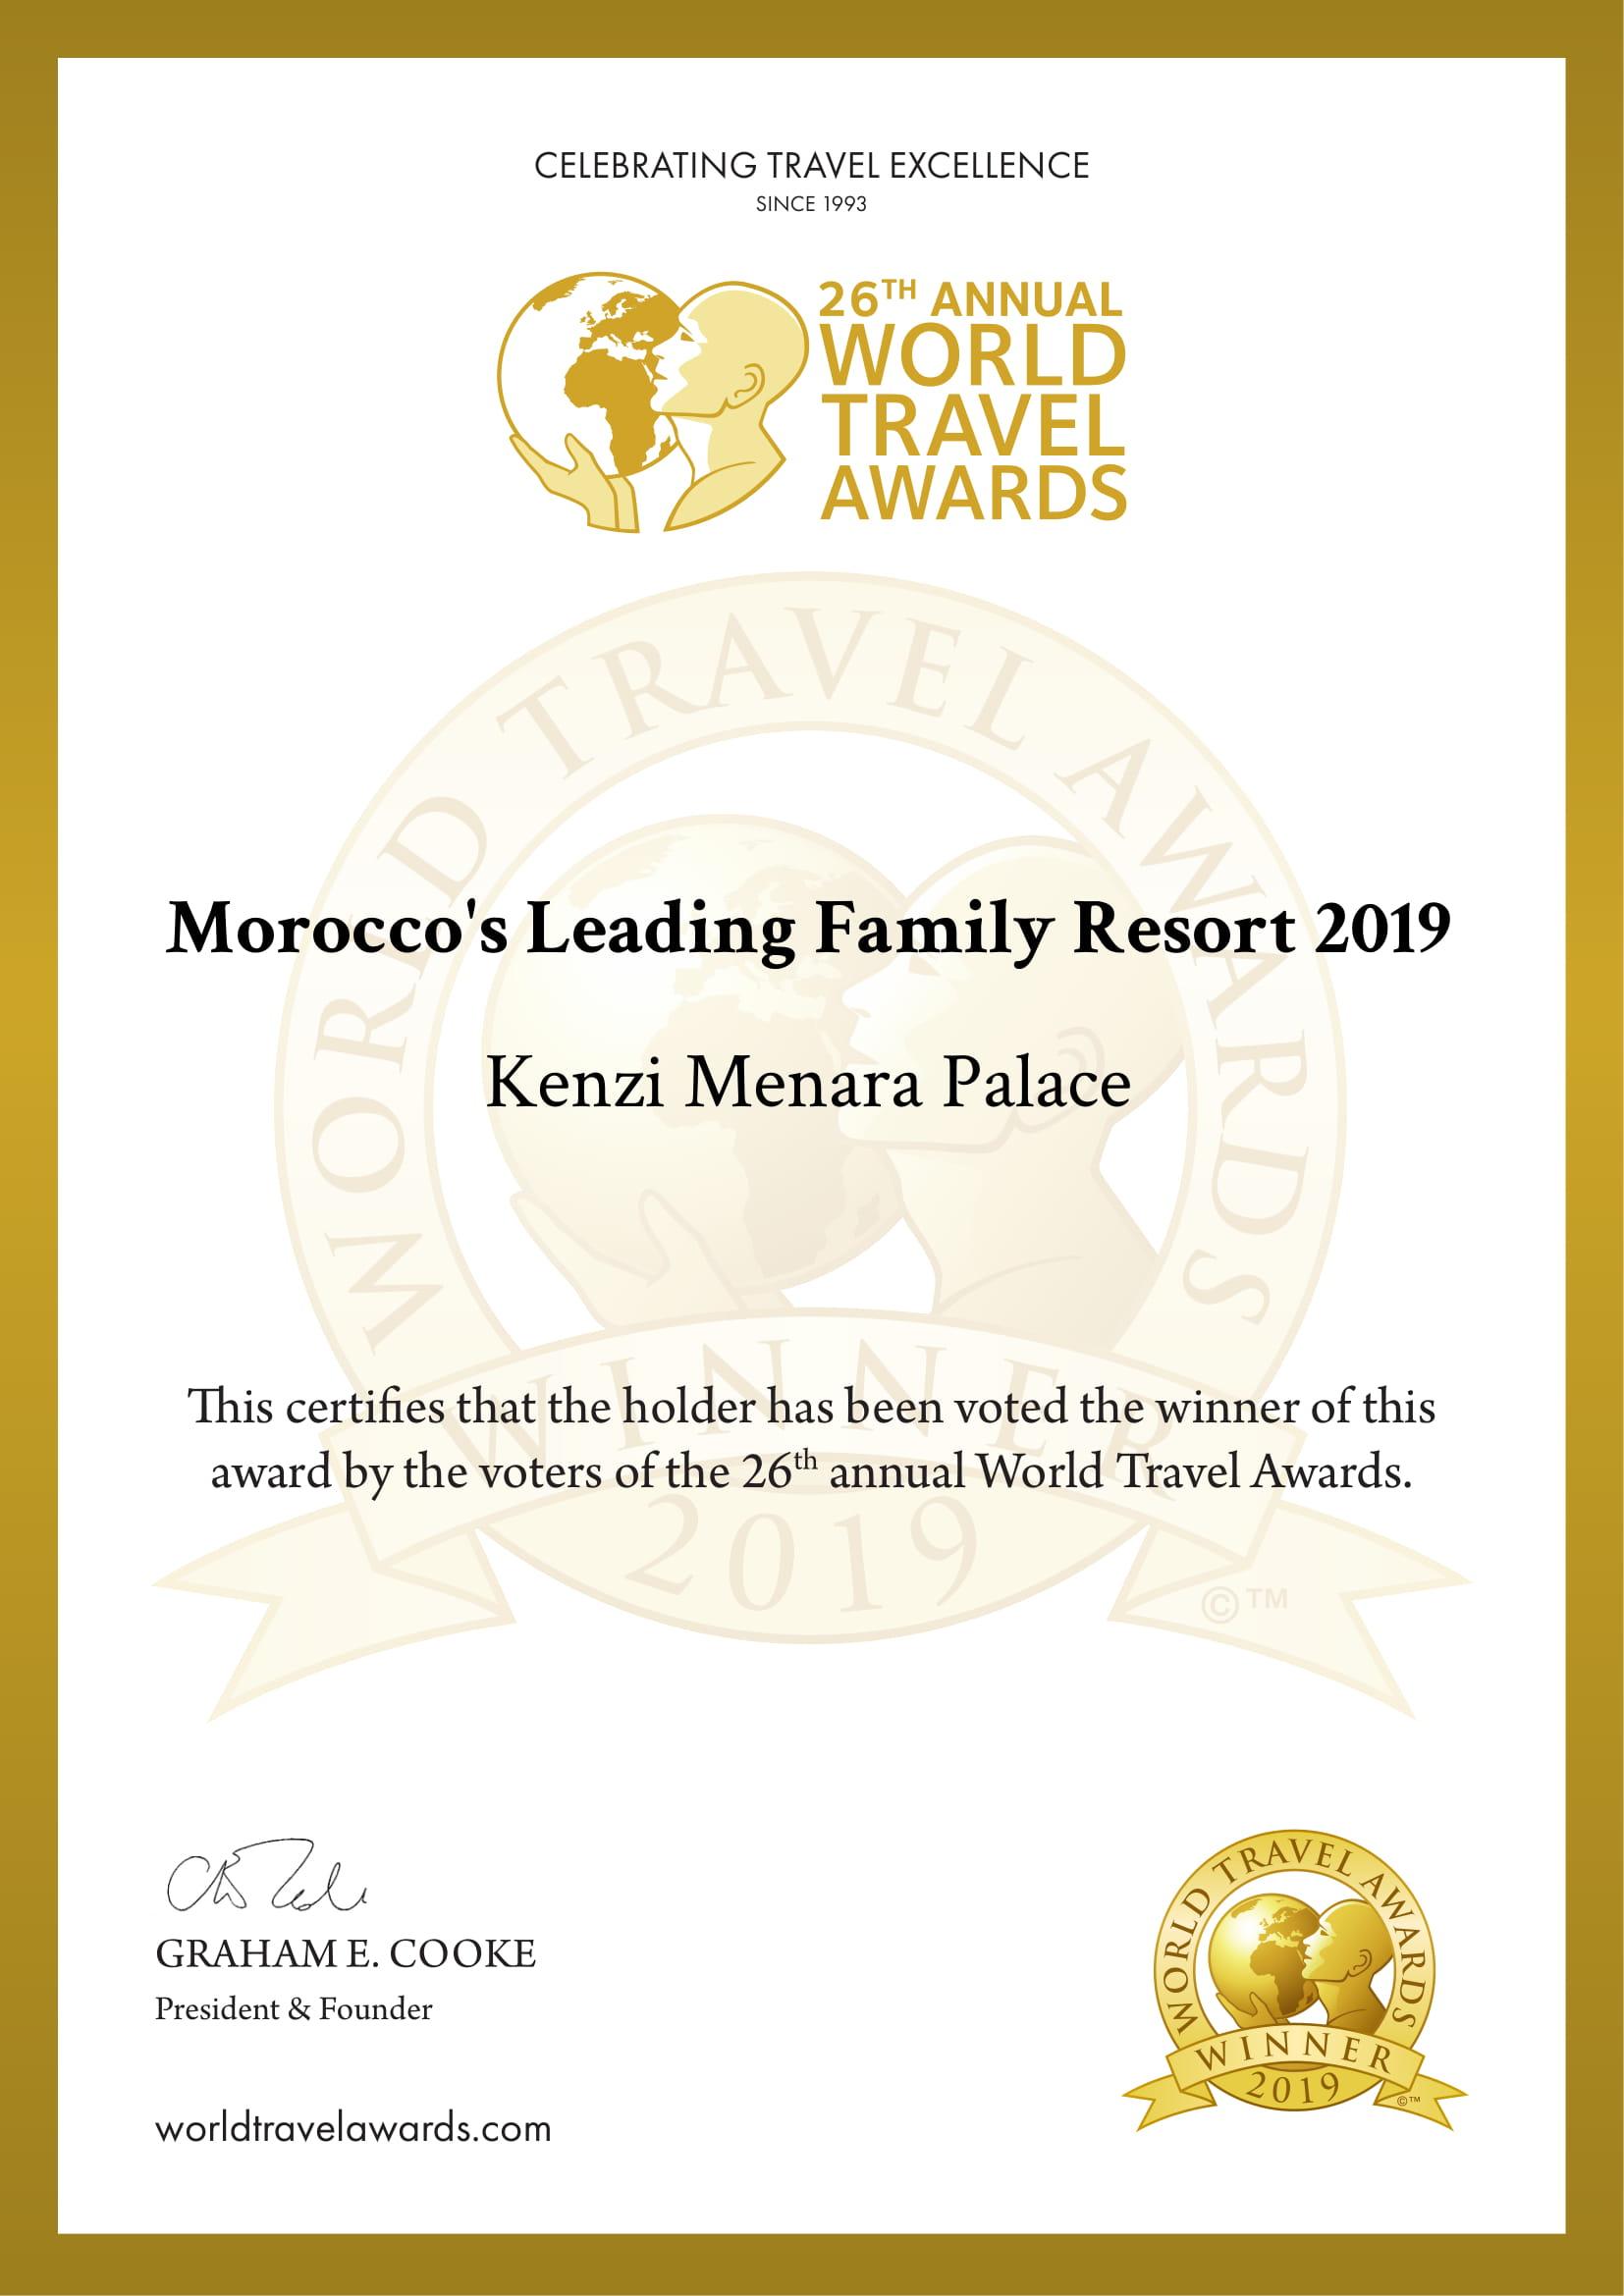 LeKenzi Menara Palace distingué segment tourisme de famille